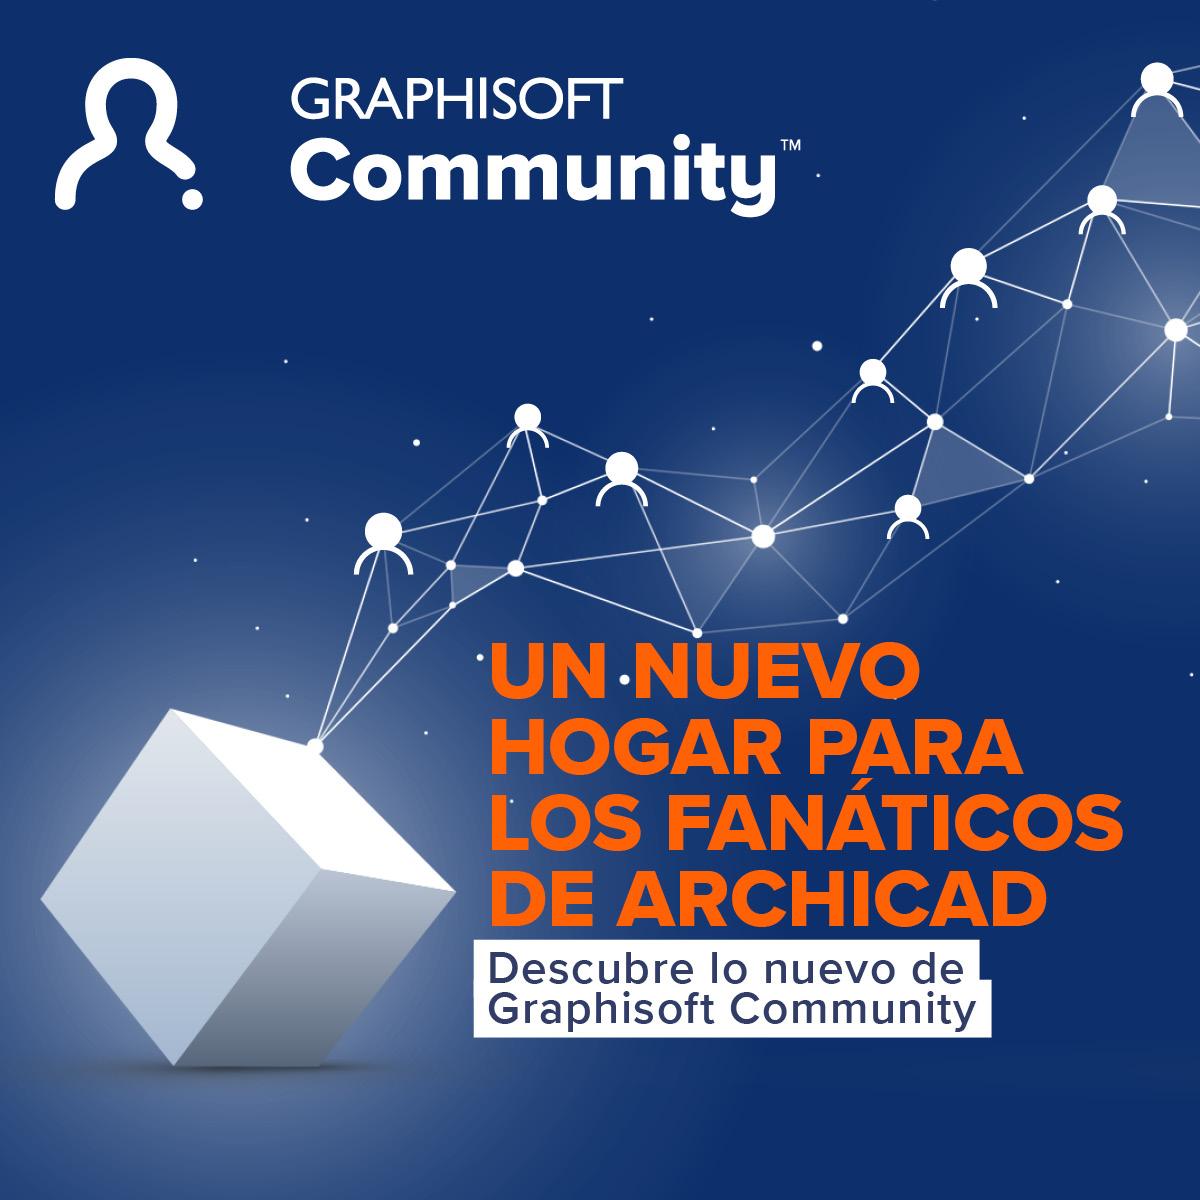 GRAPHISOFT Community